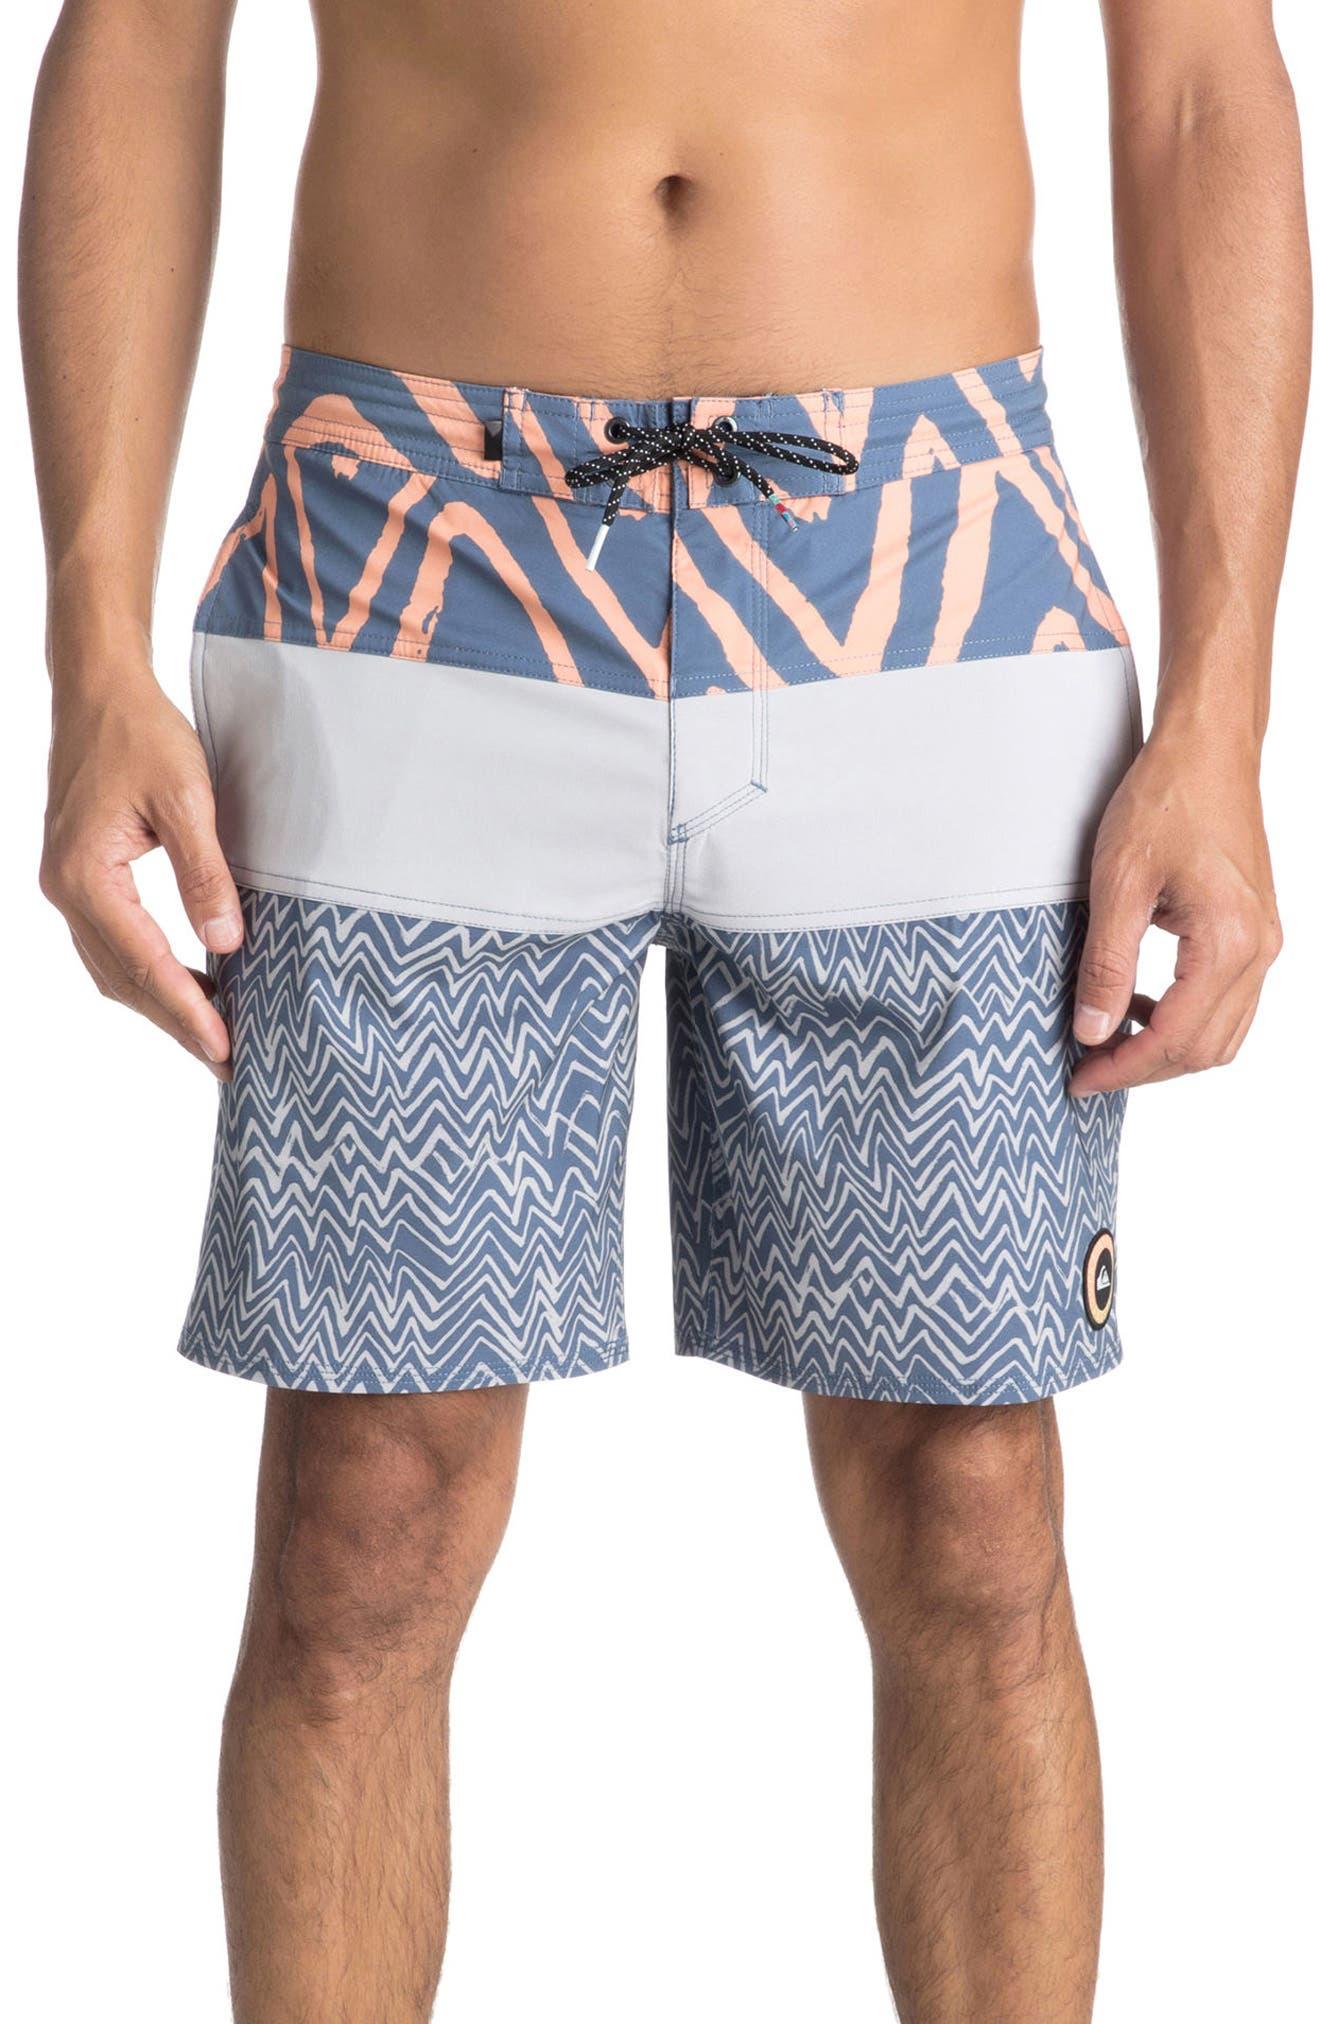 TechTonic Board Shorts,                             Main thumbnail 1, color,                             Silver Sconce